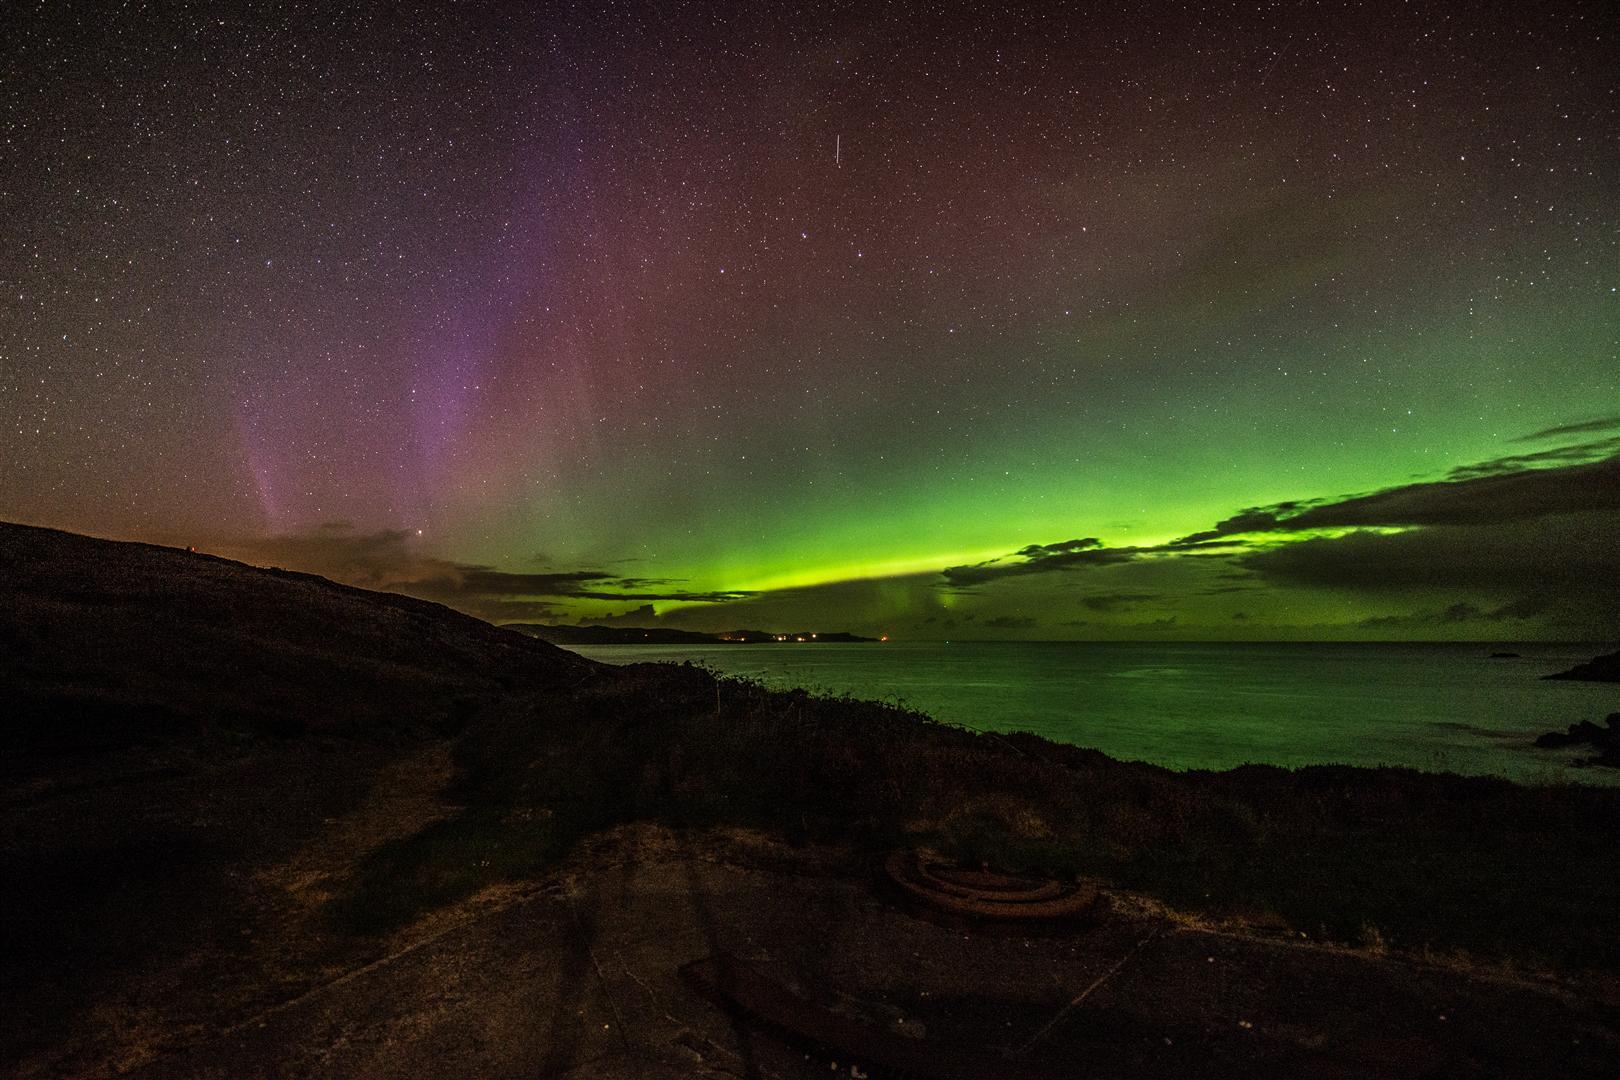 Dunree Aurora Borealis - Northern Lights - DSC_1523-Edit (Large).jpg